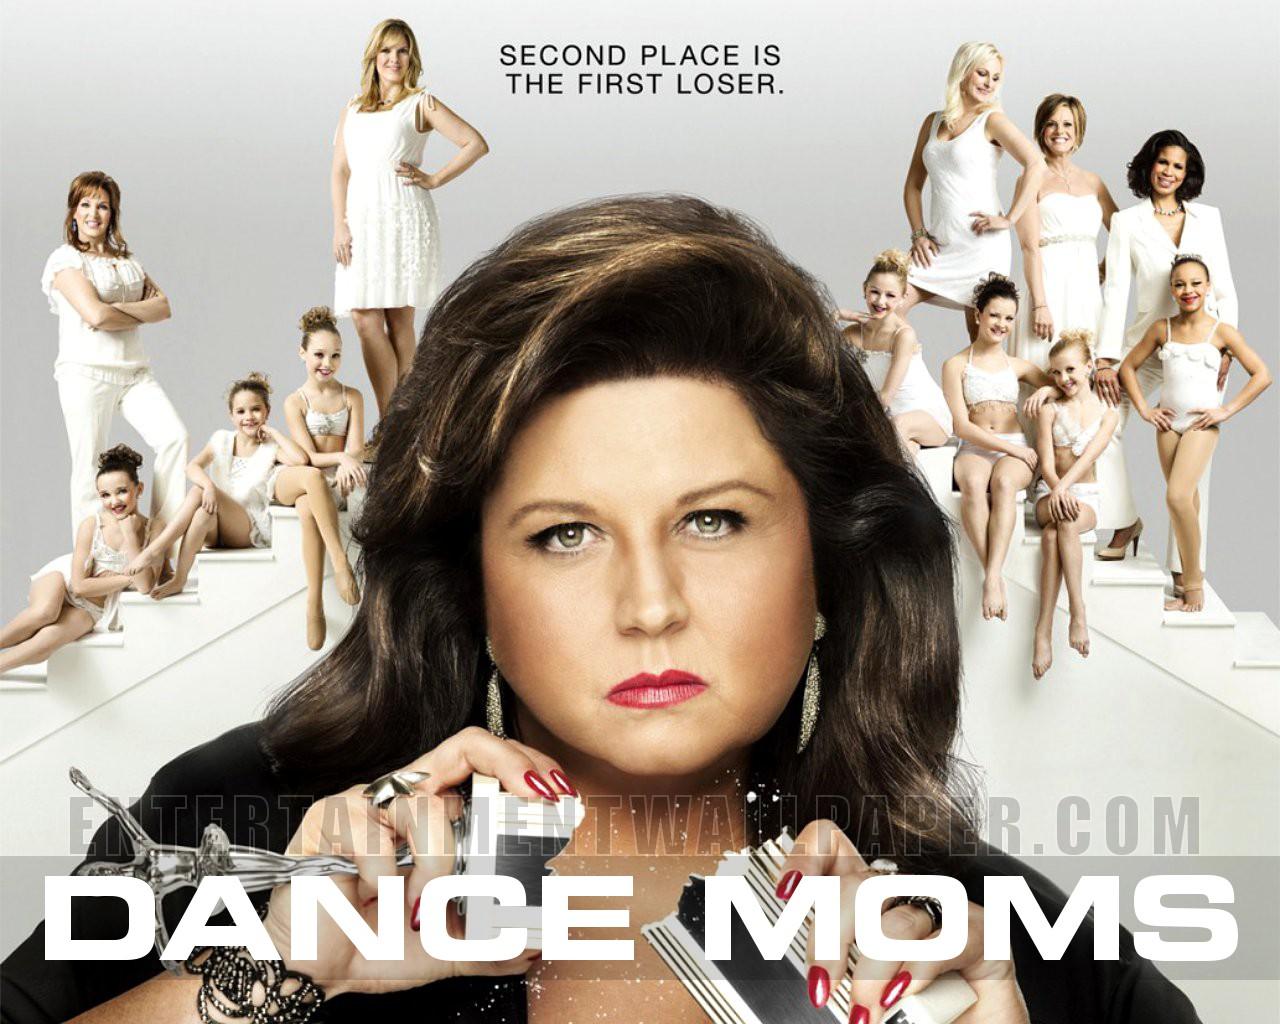 dance moms wallpaper 20032969 size 1280x1024 more dance moms wallpaper 1280x1024